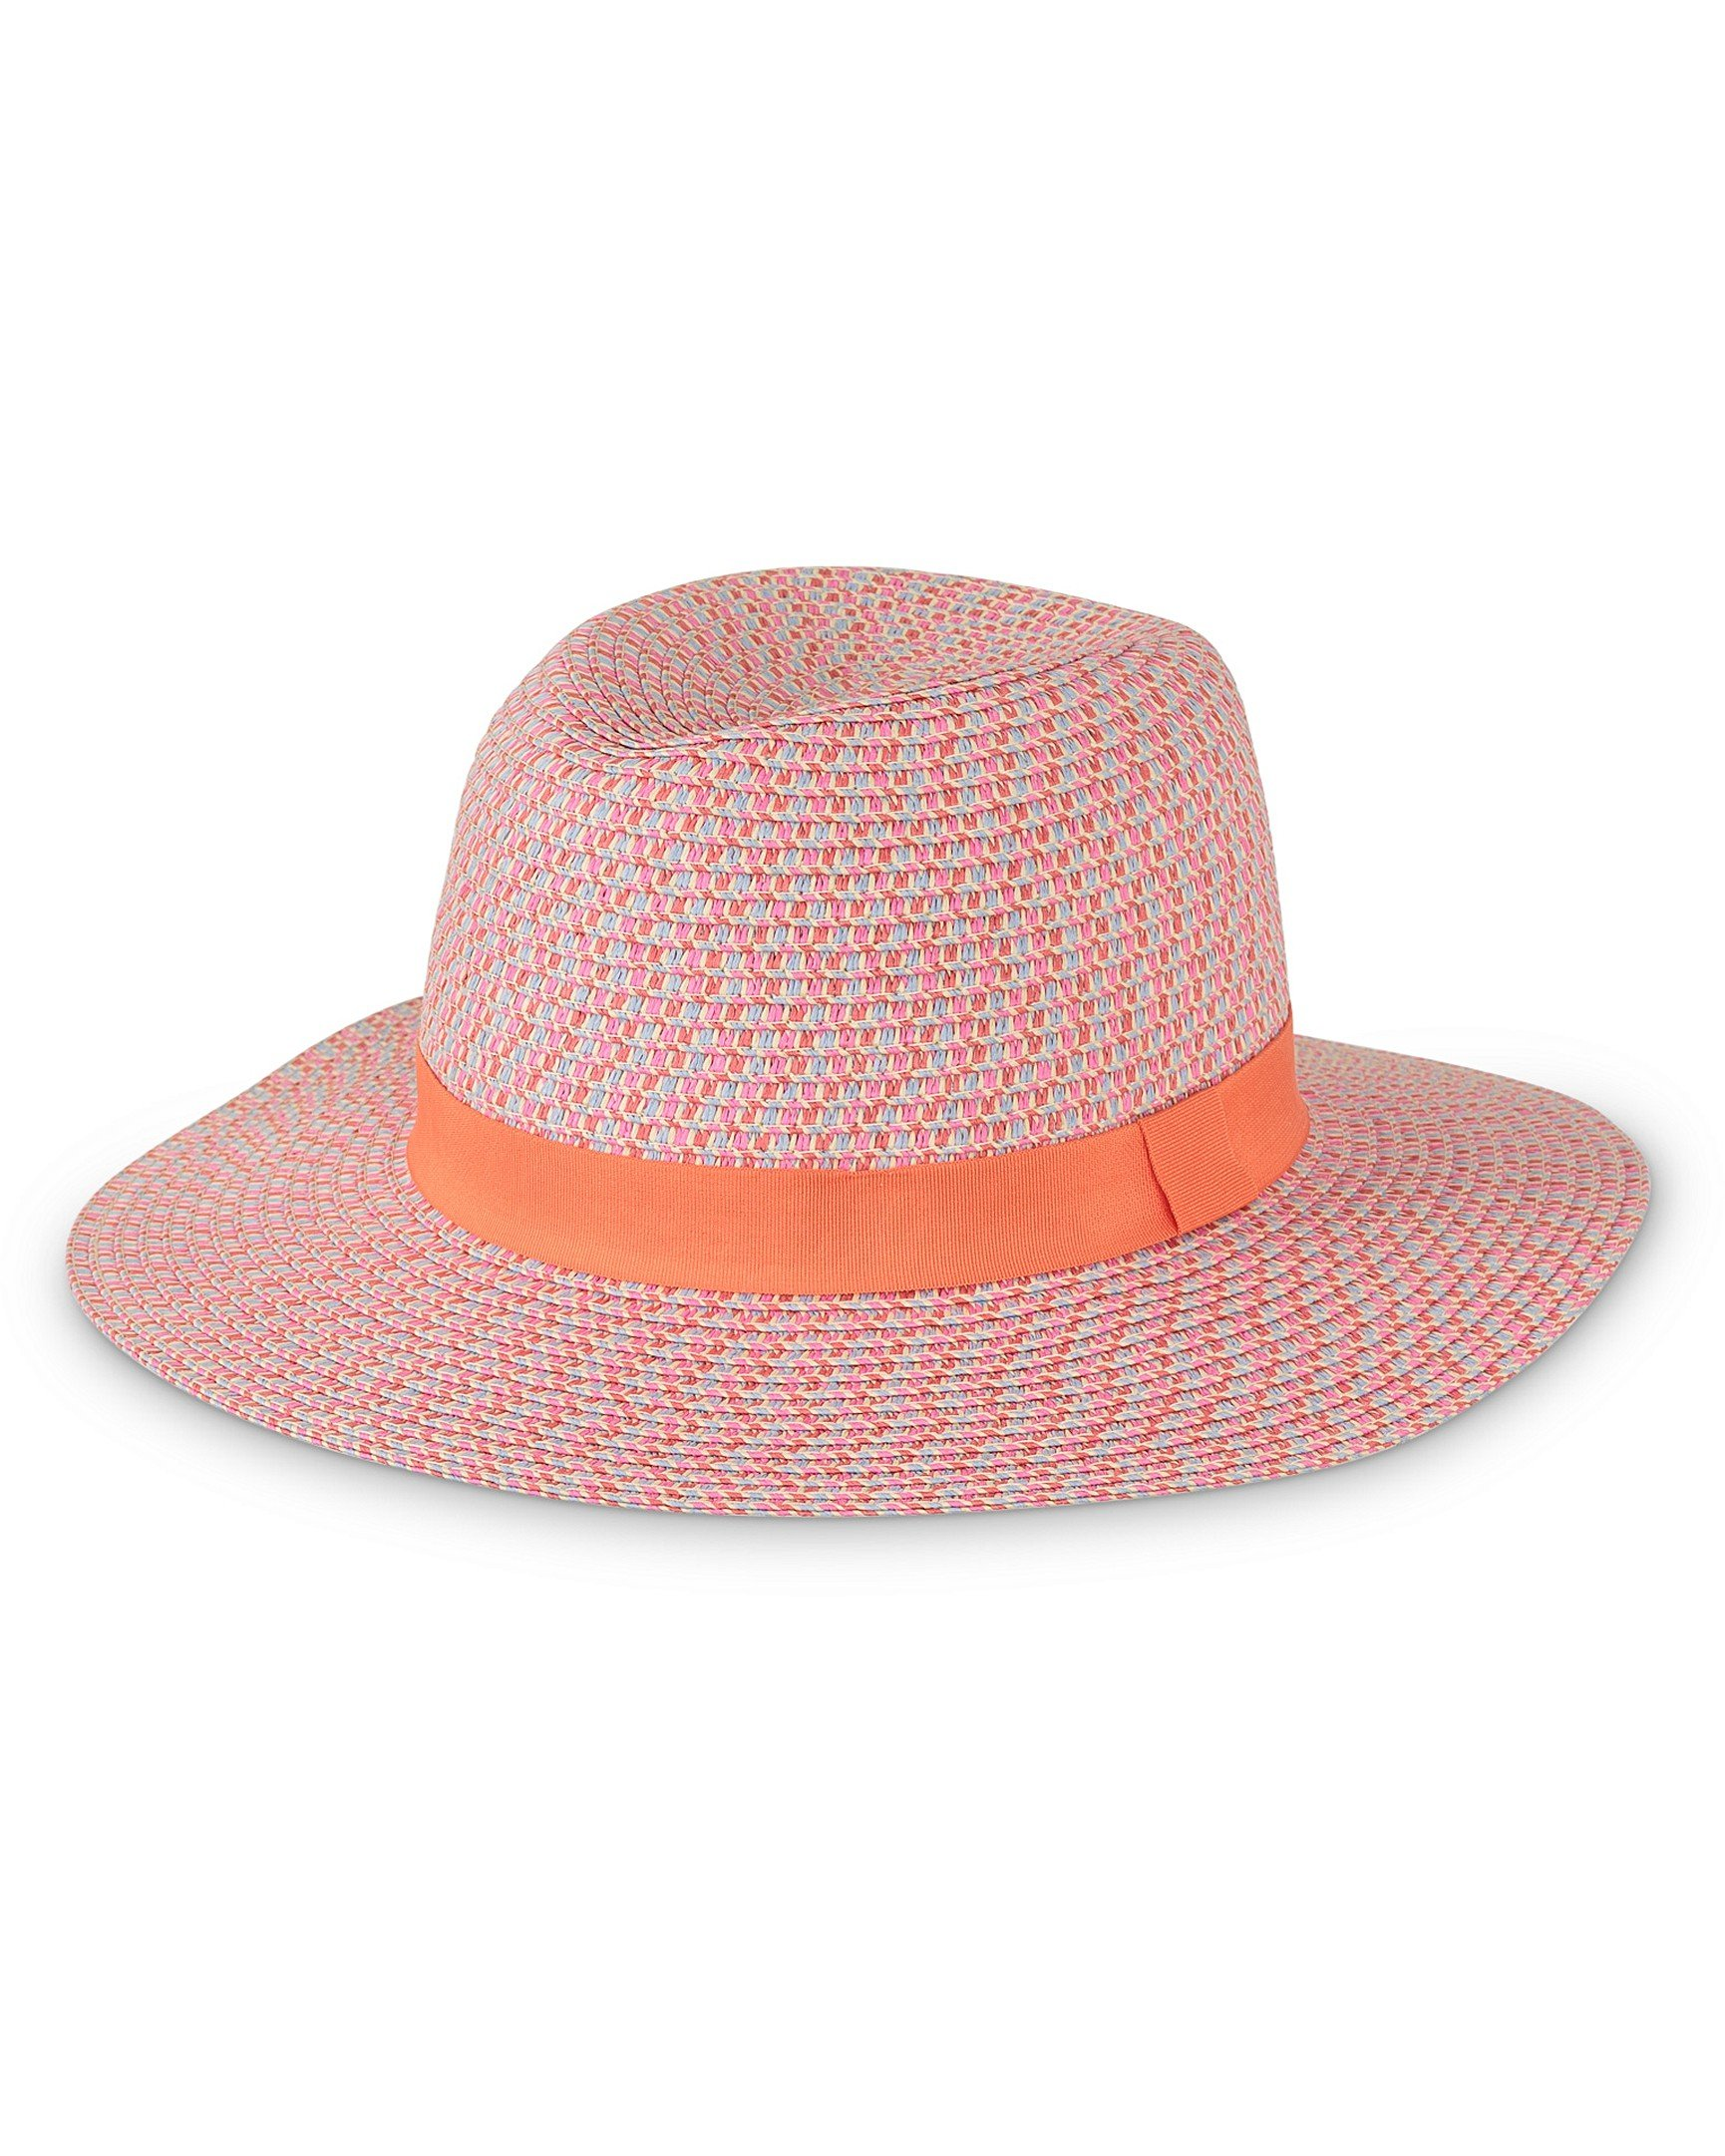 Rainbow Twist Pink Fedora Hat e8cdce2c532b